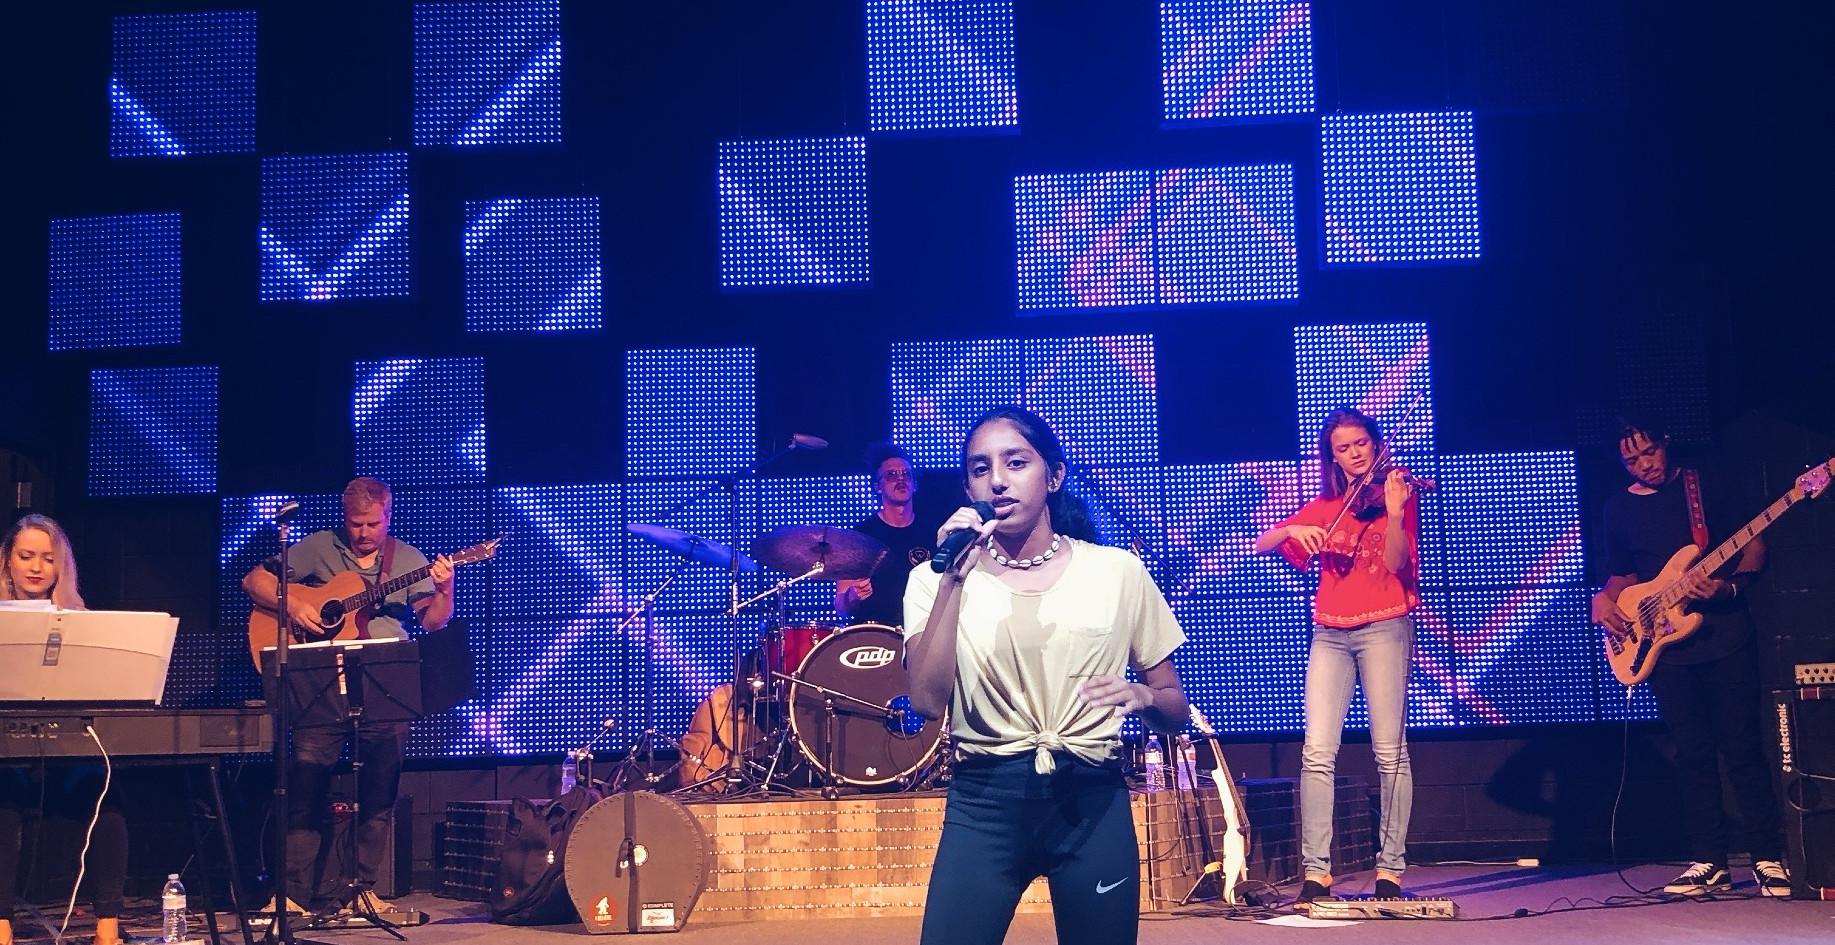 live band concert